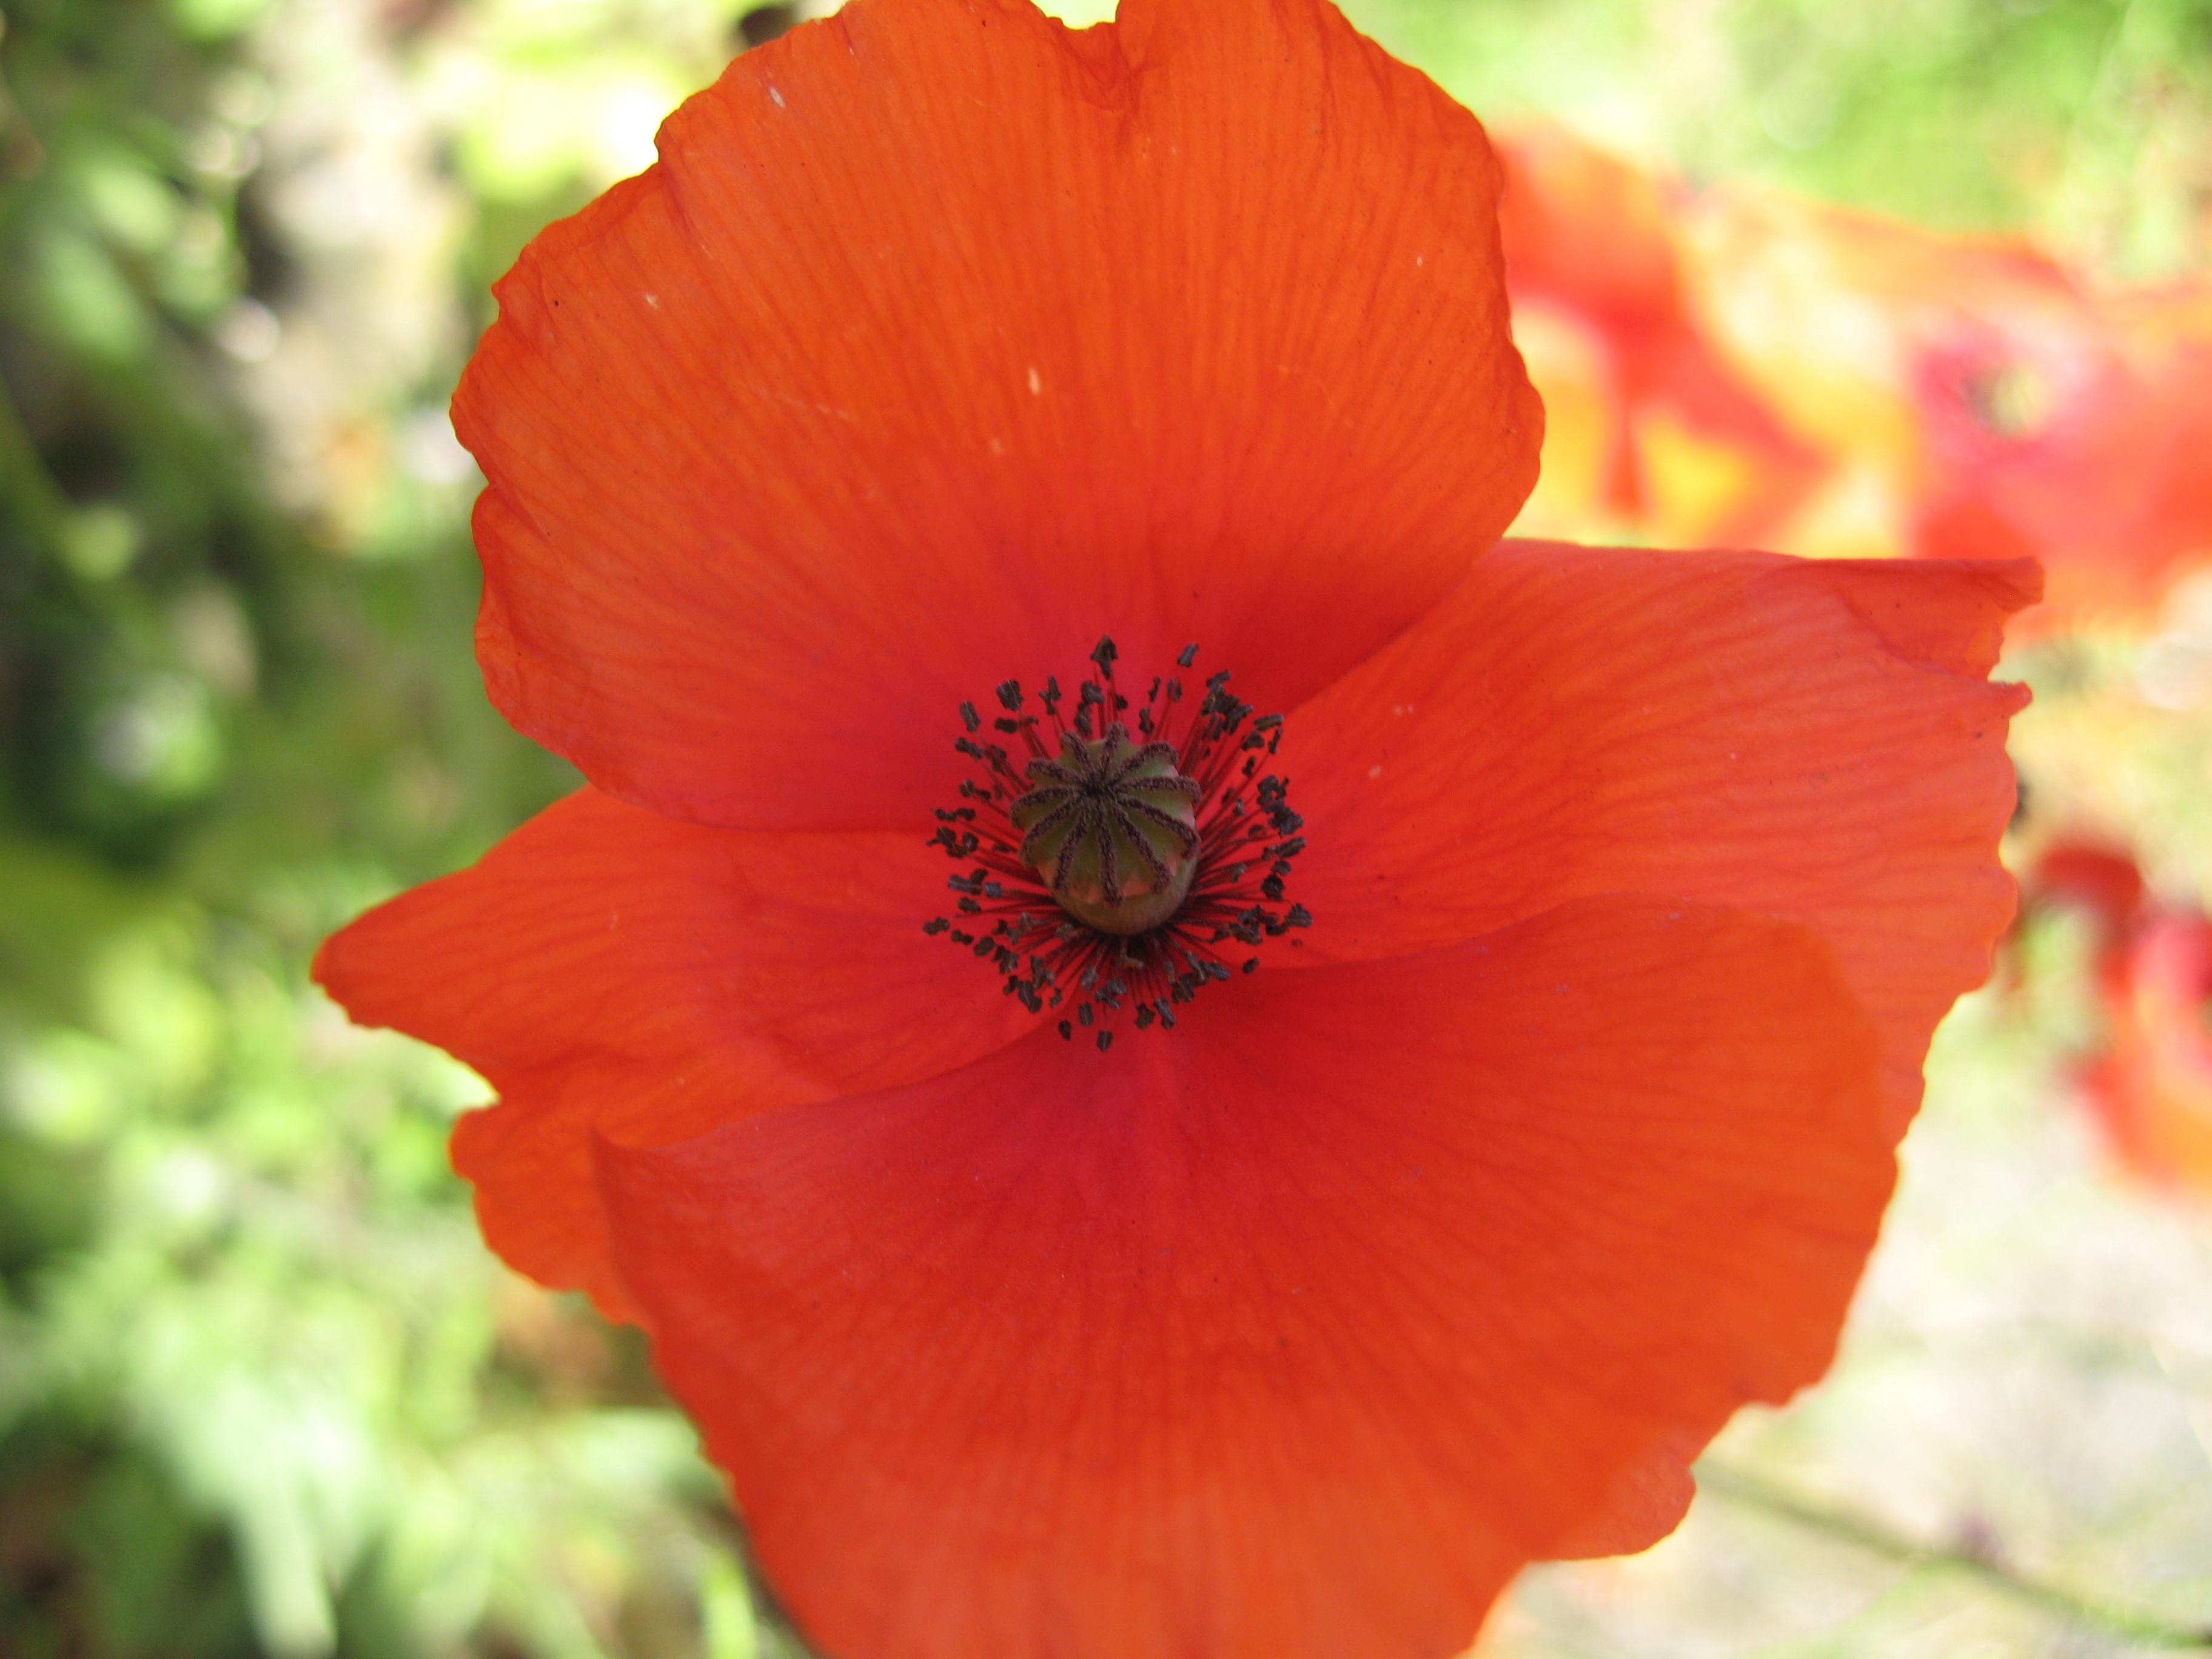 Scientific name of poppy flower choice image flower decoration ideas papaver somniferum wikipedia mightylinksfo